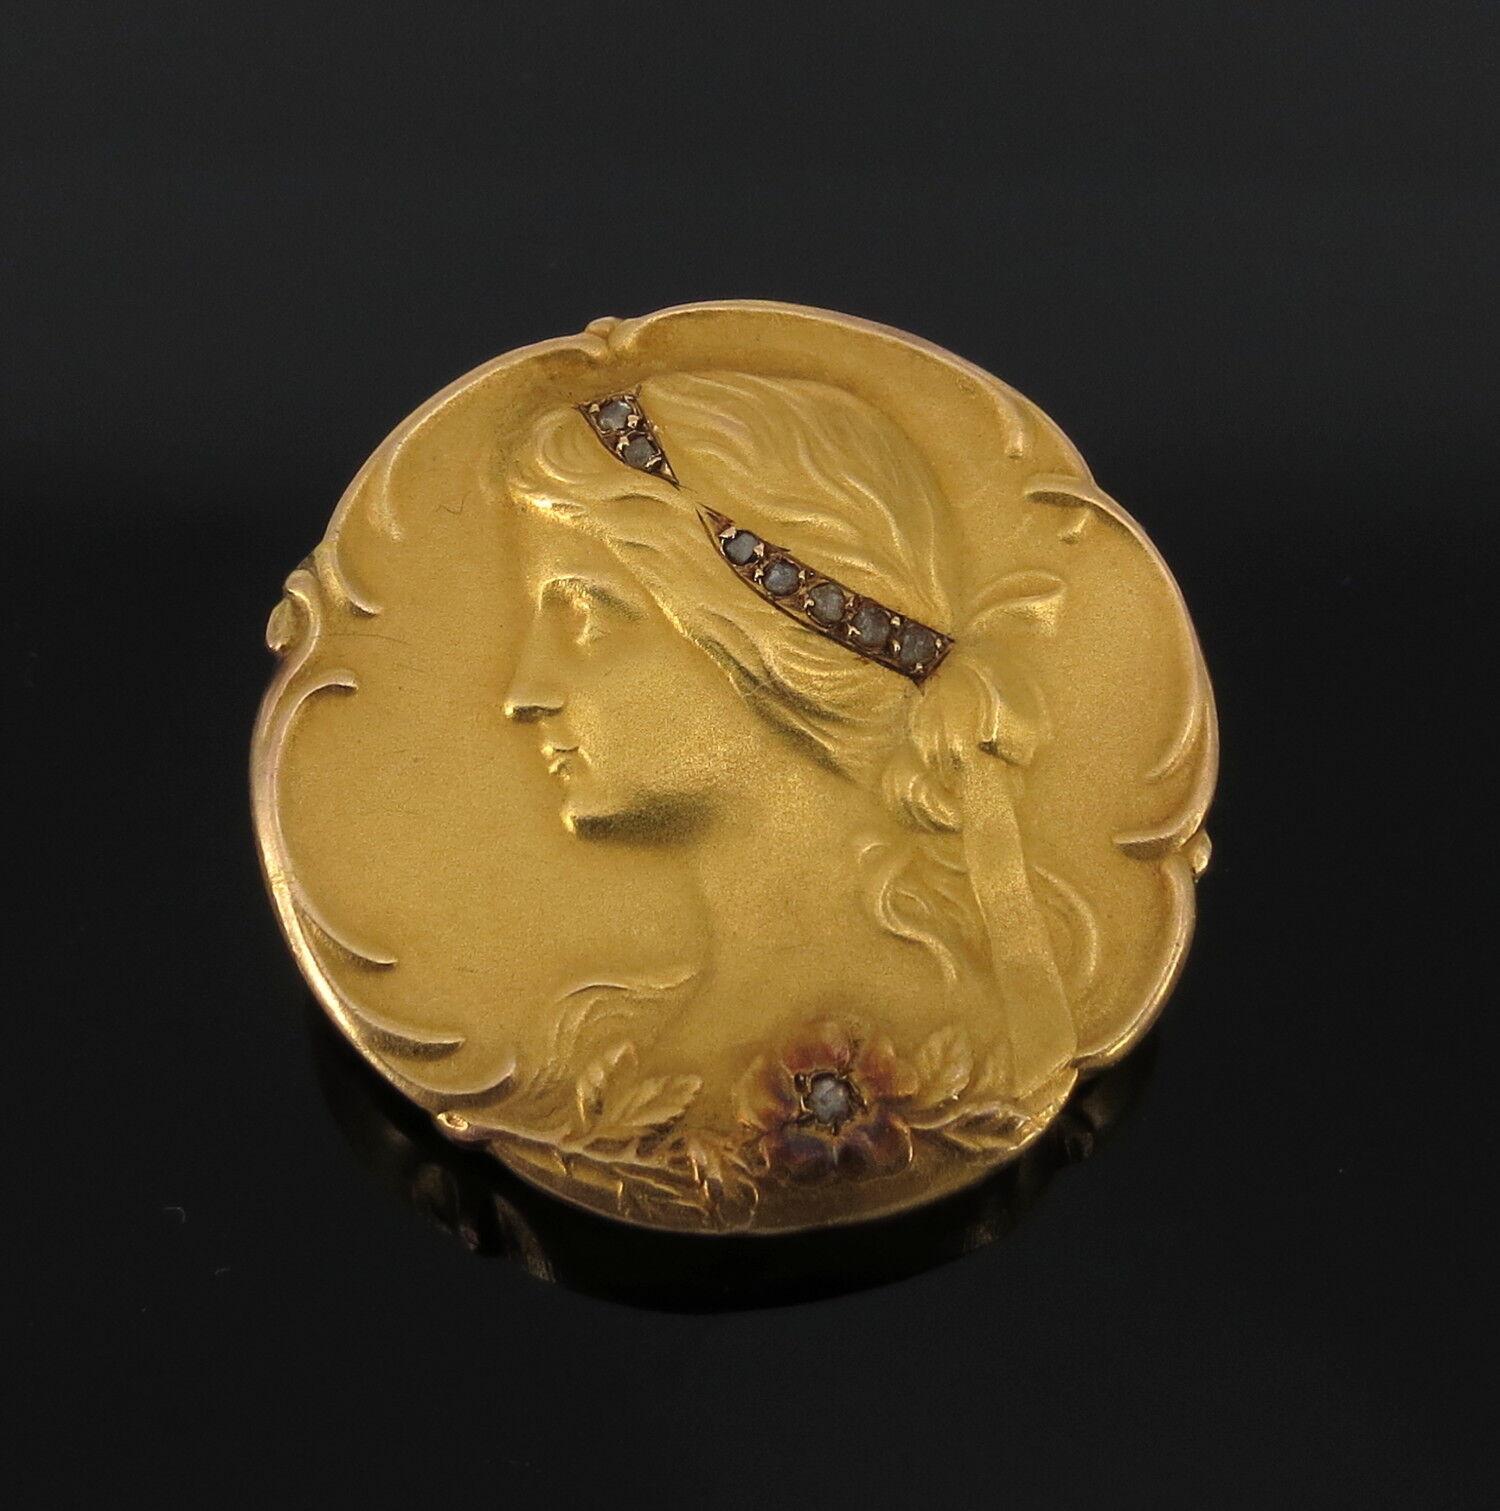 Antique Art Nouveau 0.07ct pink Cut Diamond & 18K Yellow gold Cameo Brooch